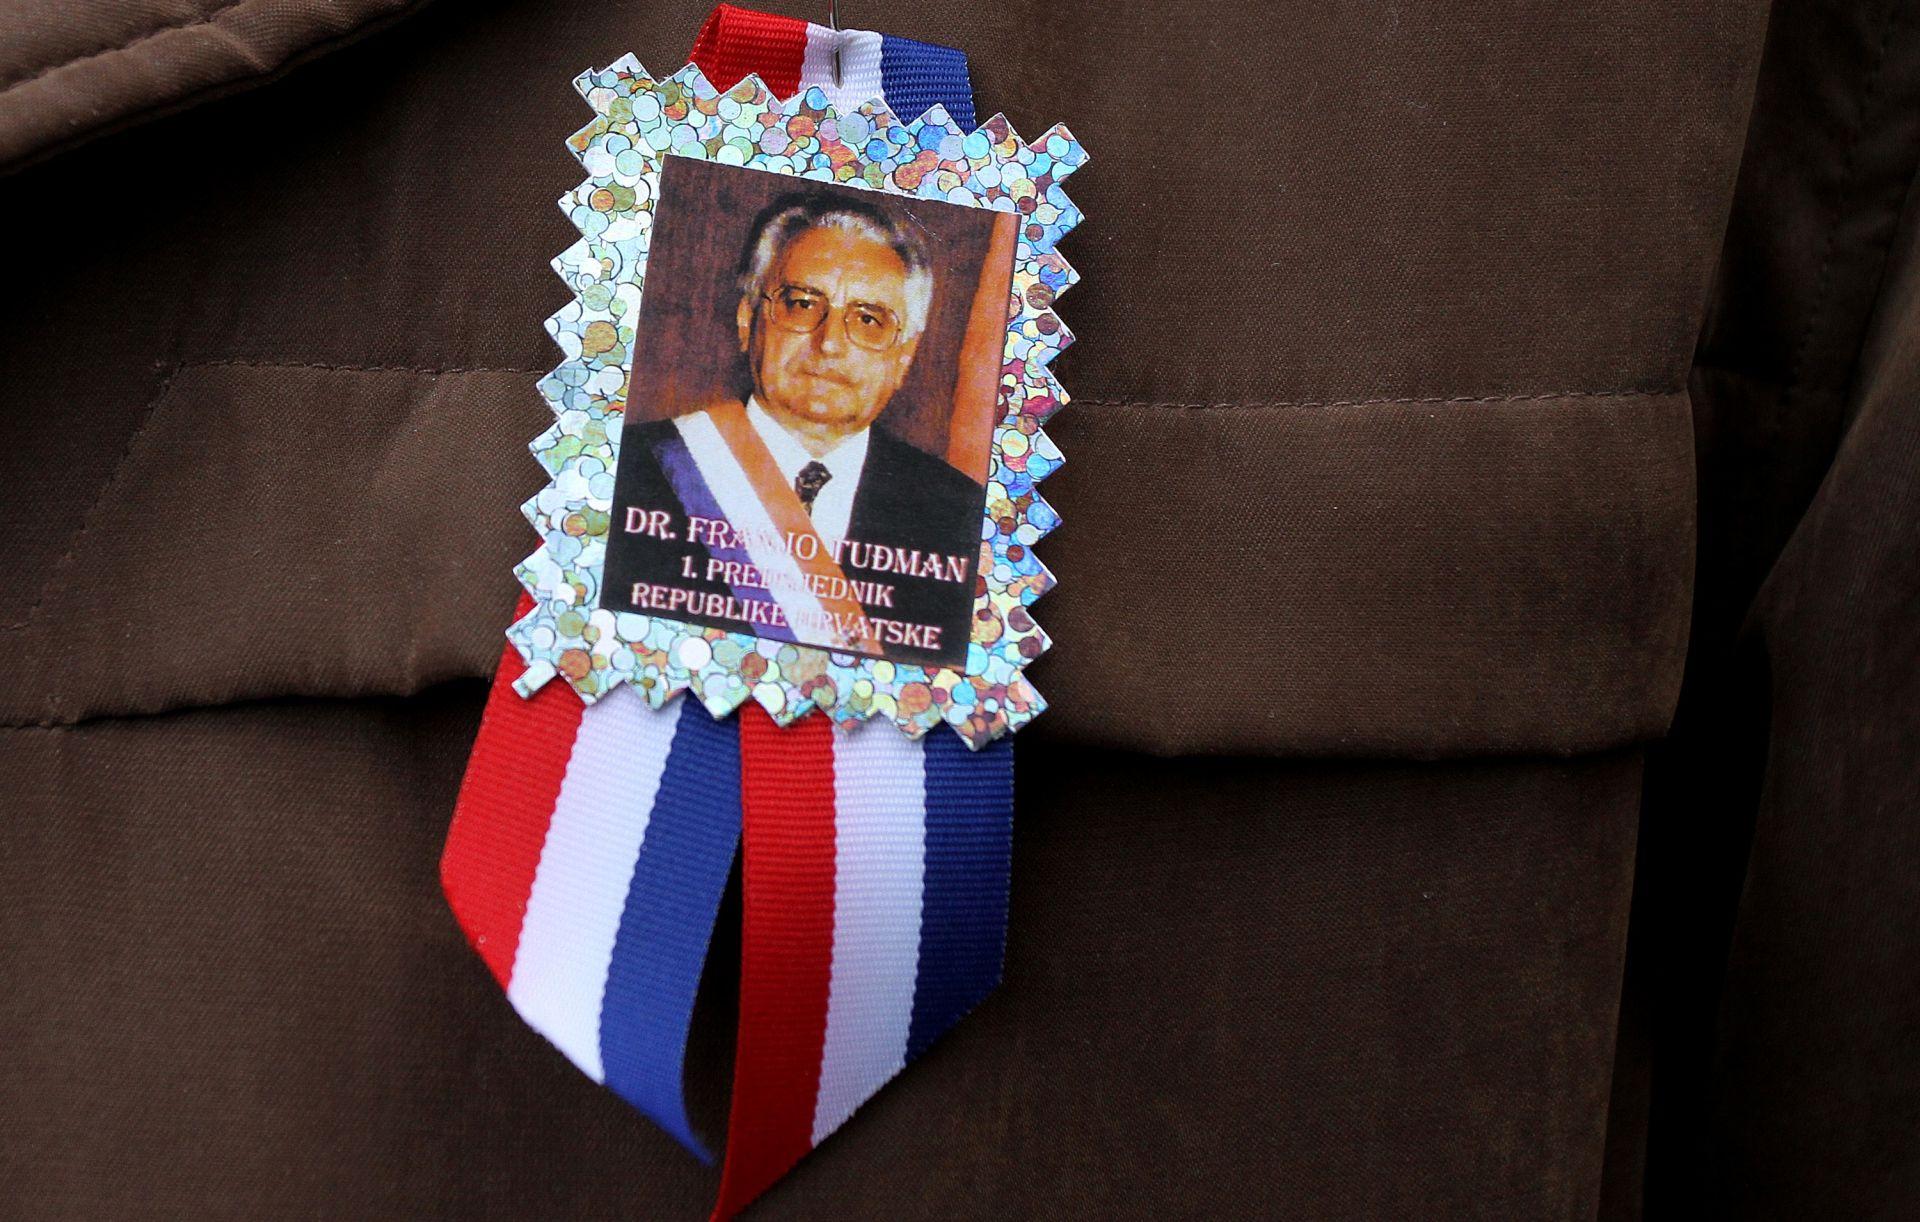 Obilježava se 16. godišnjica smrti Franje Tuđmana